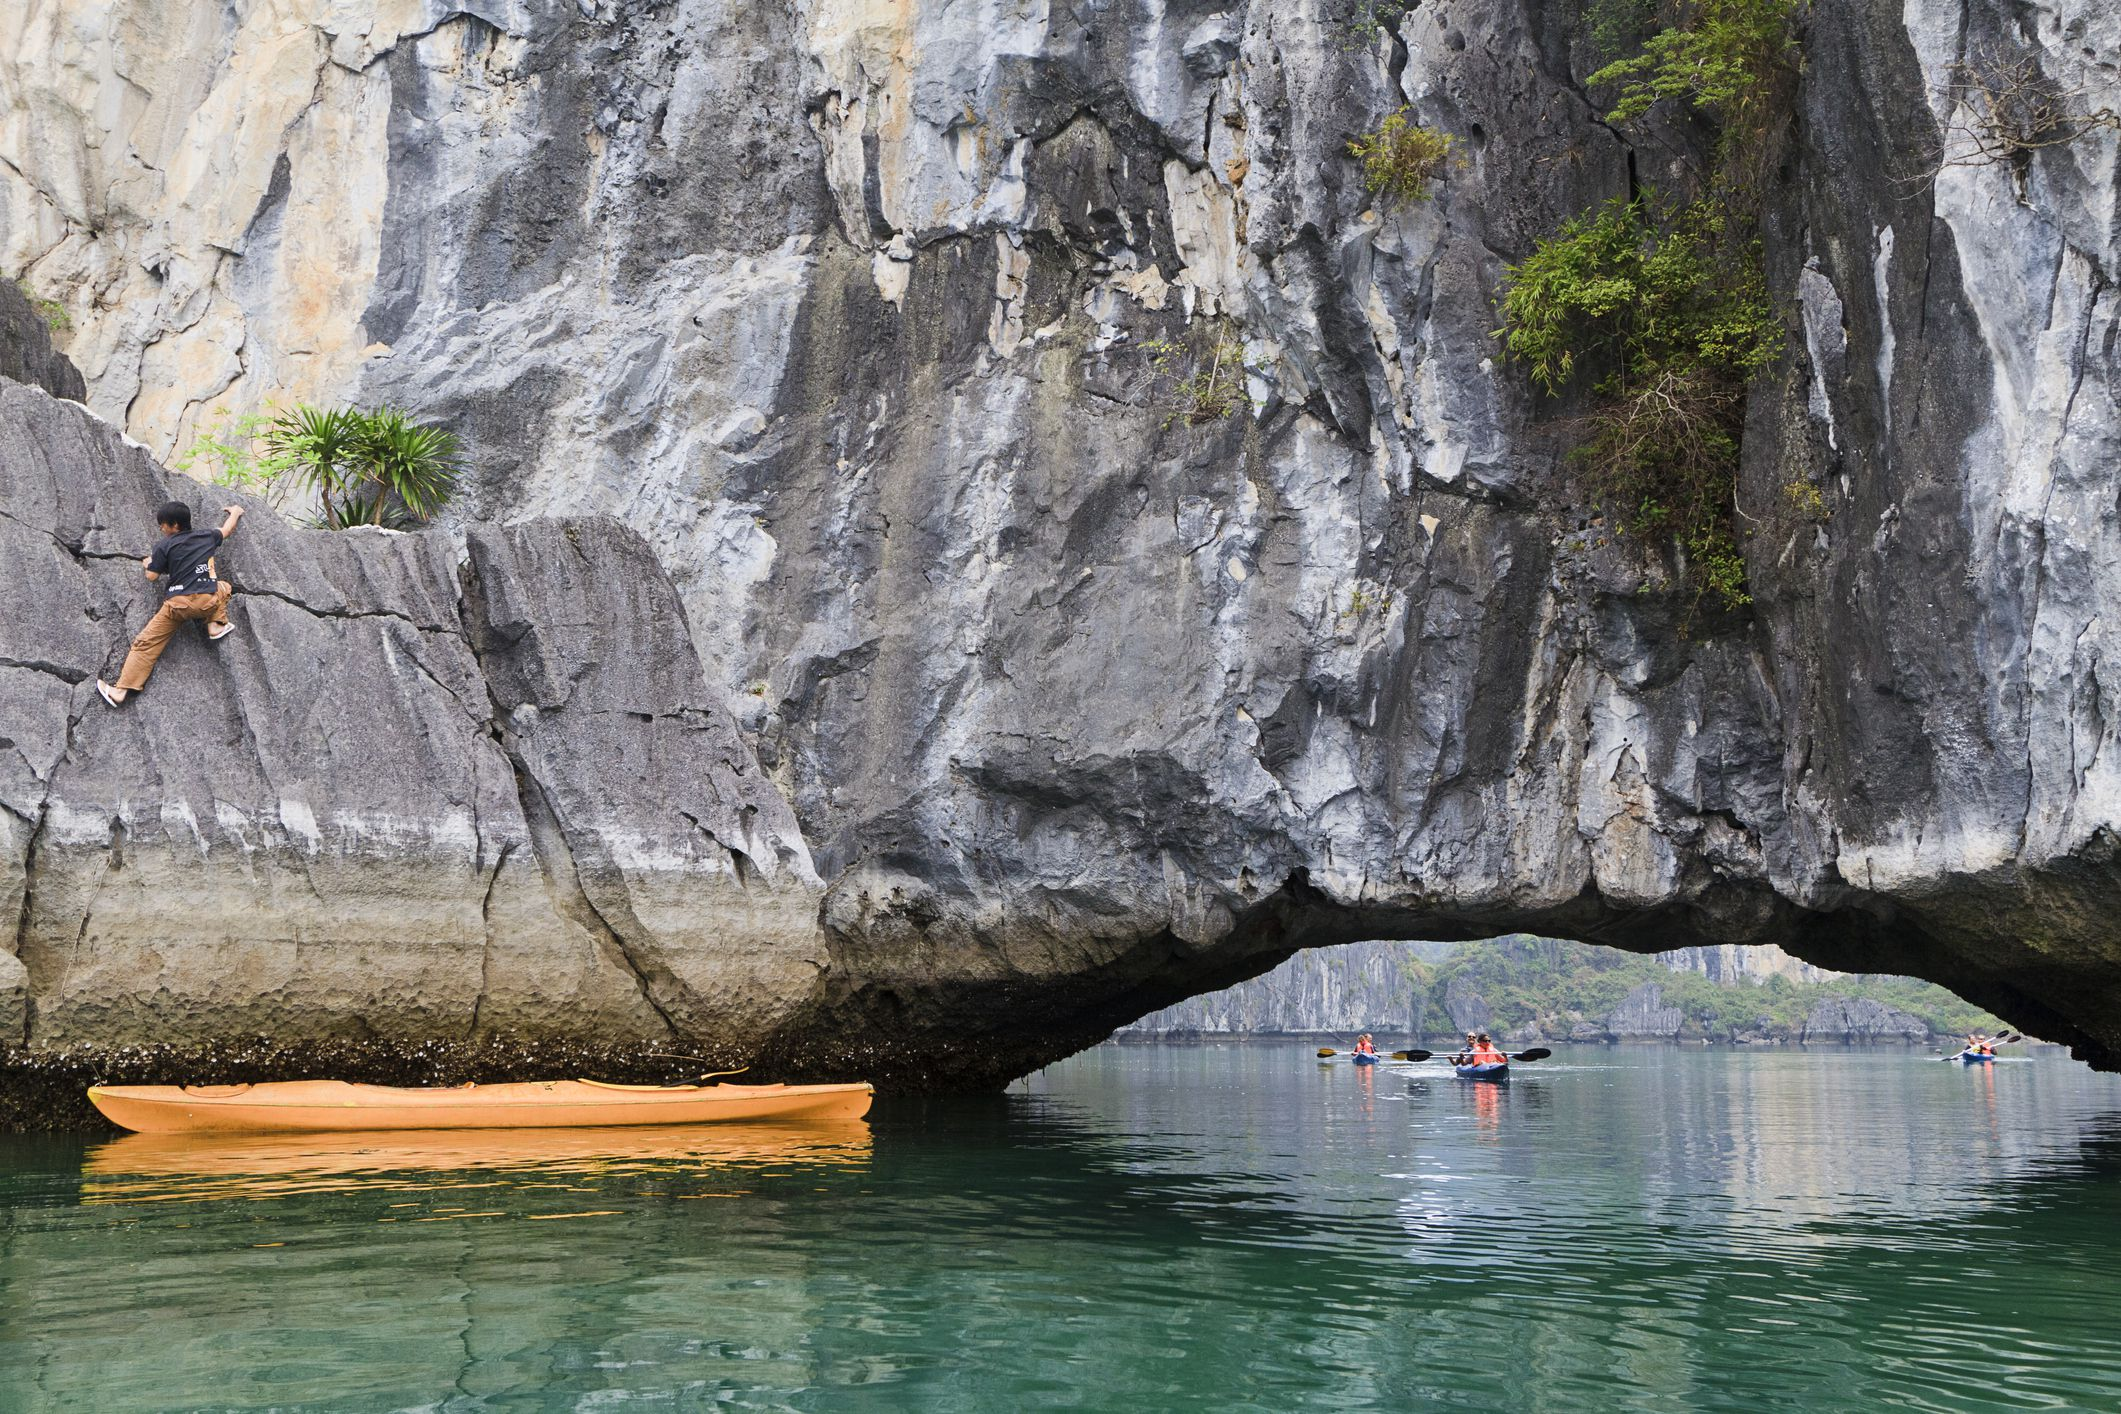 Rock climber and kayakers on Ha Long Bay, Vietnam